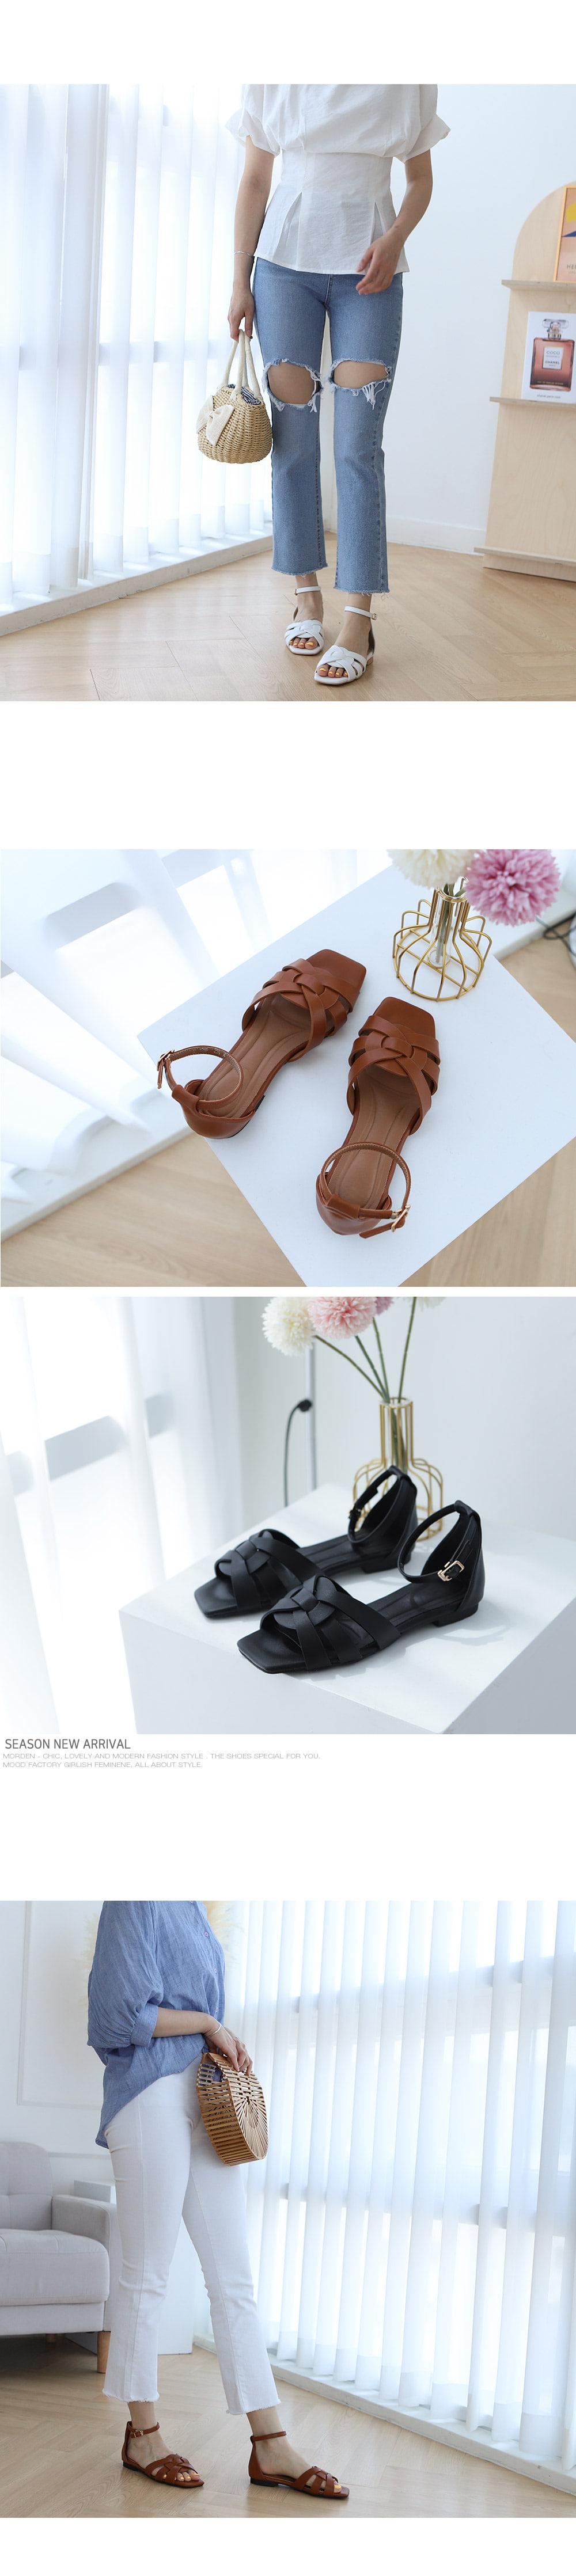 [Handmade] Square Toe Woven Sandals-Holiholic